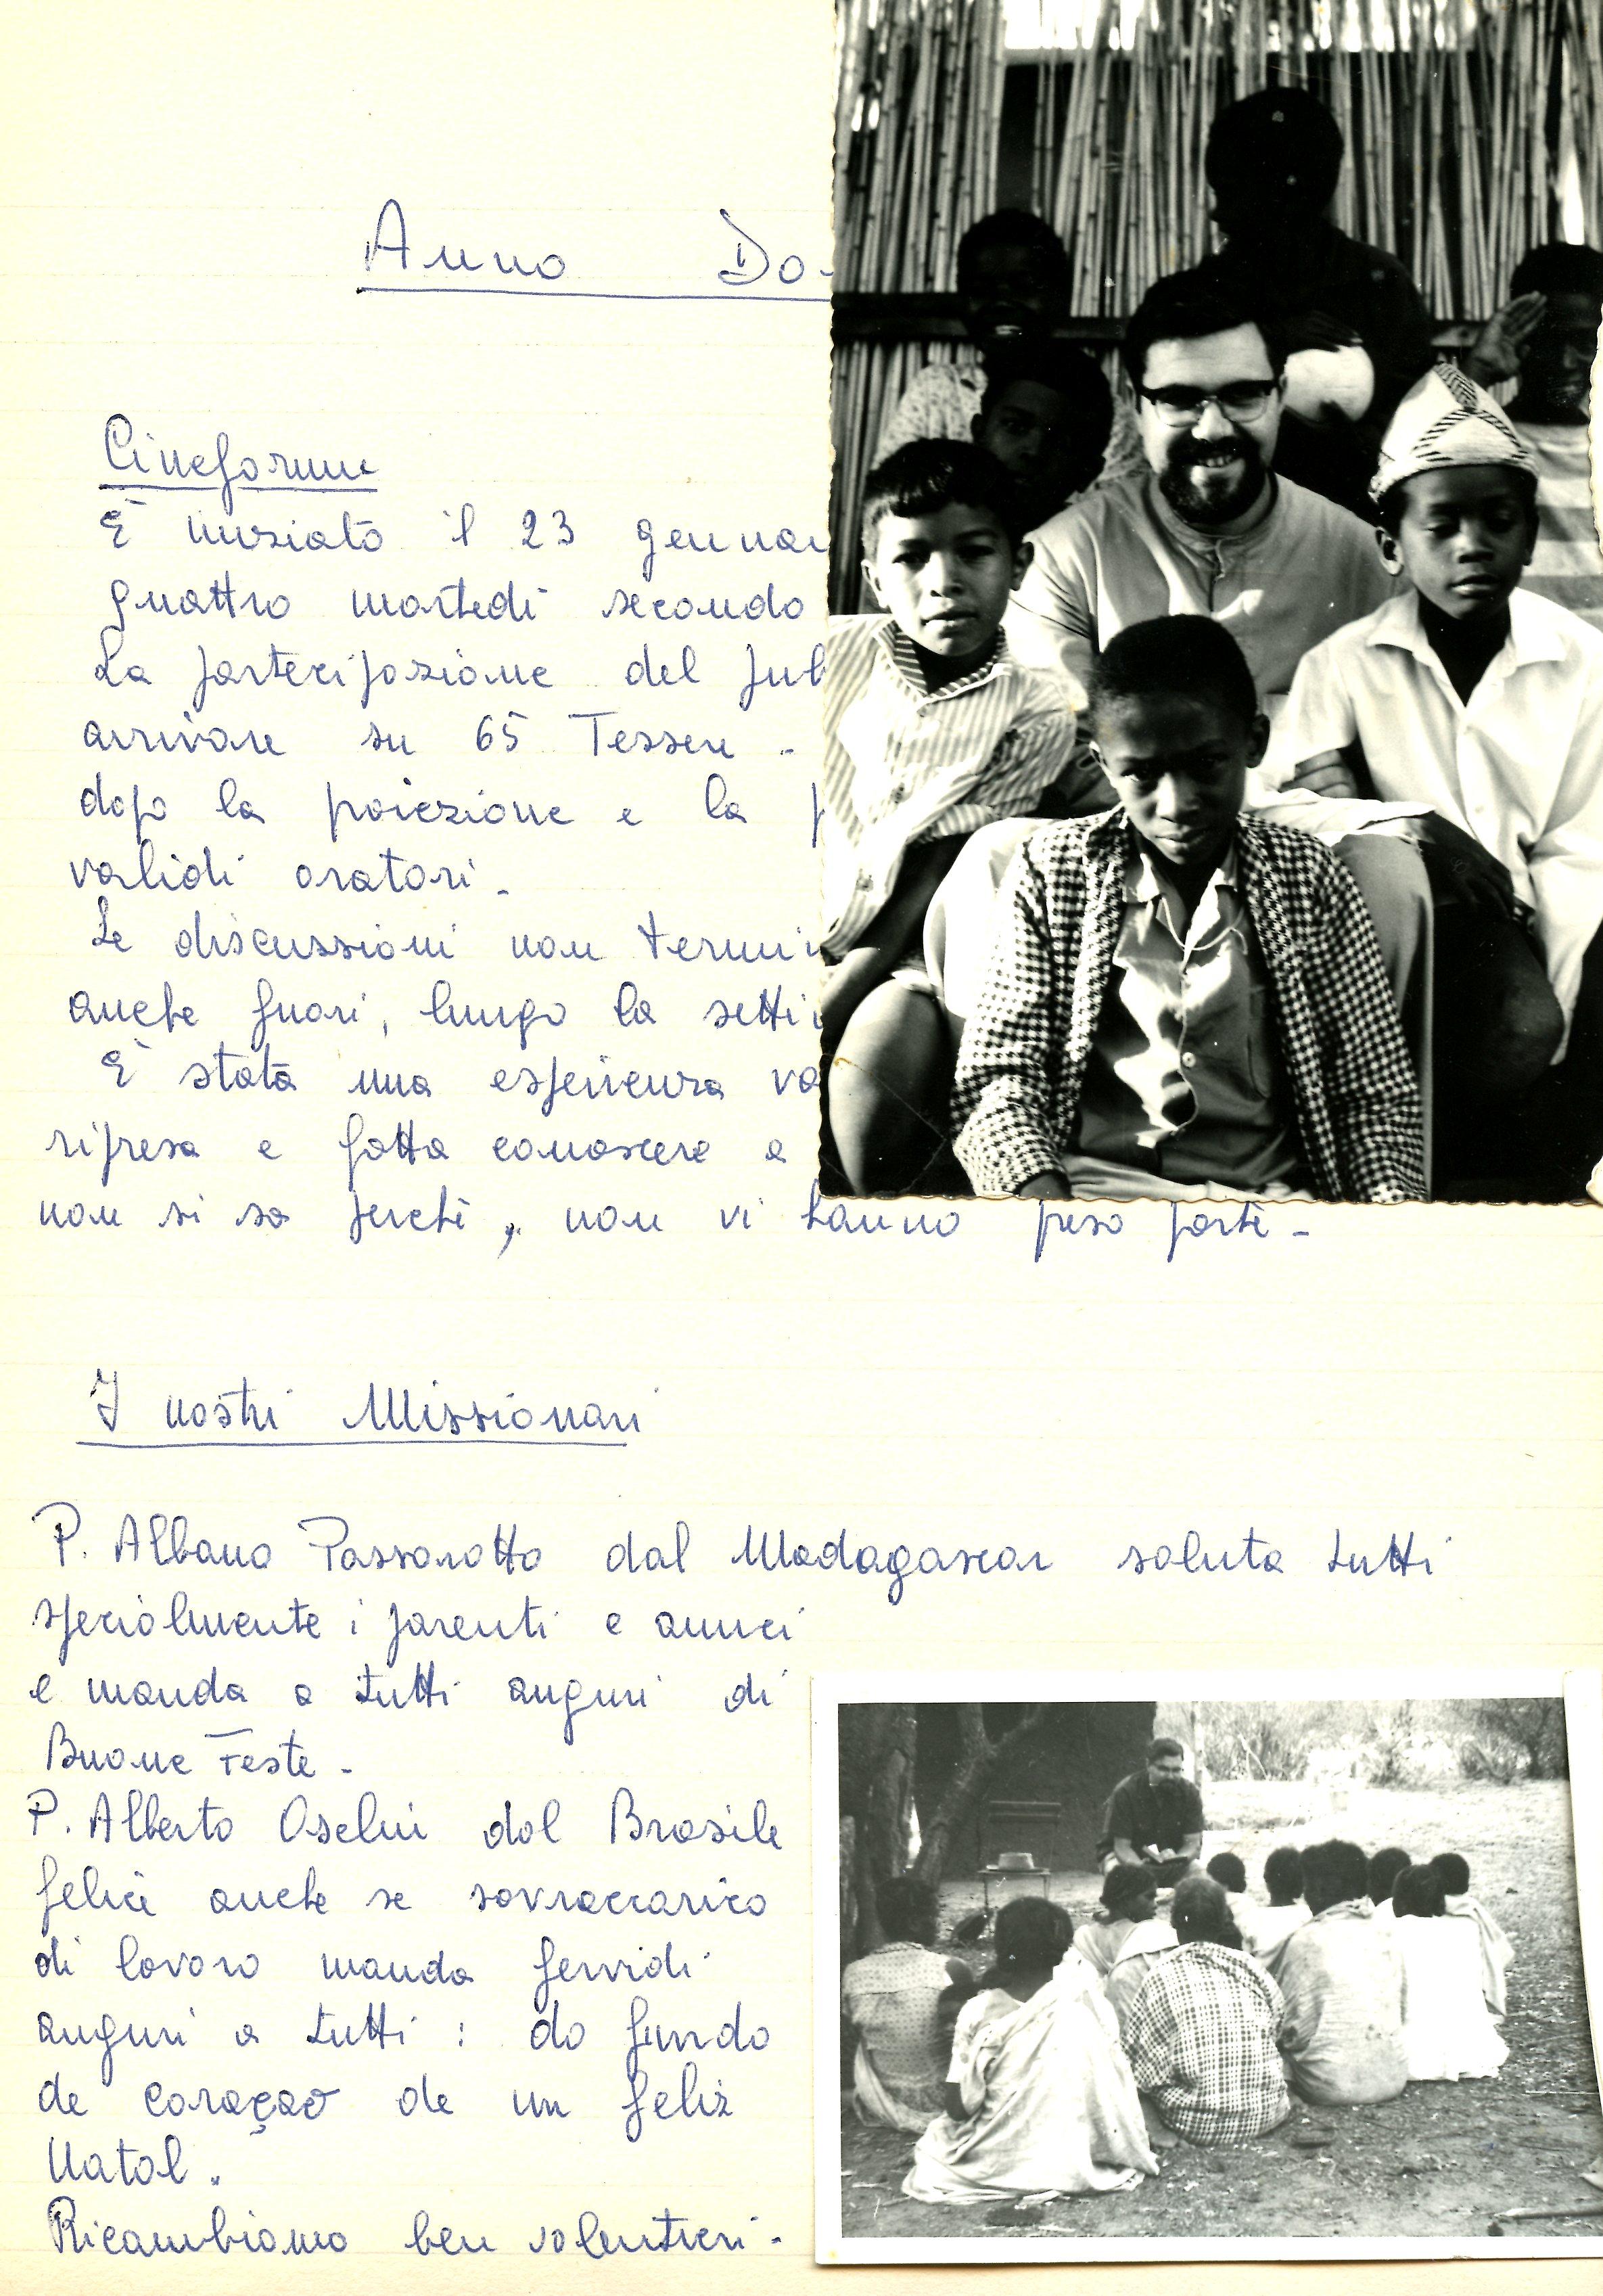 PADRE ALBANO475